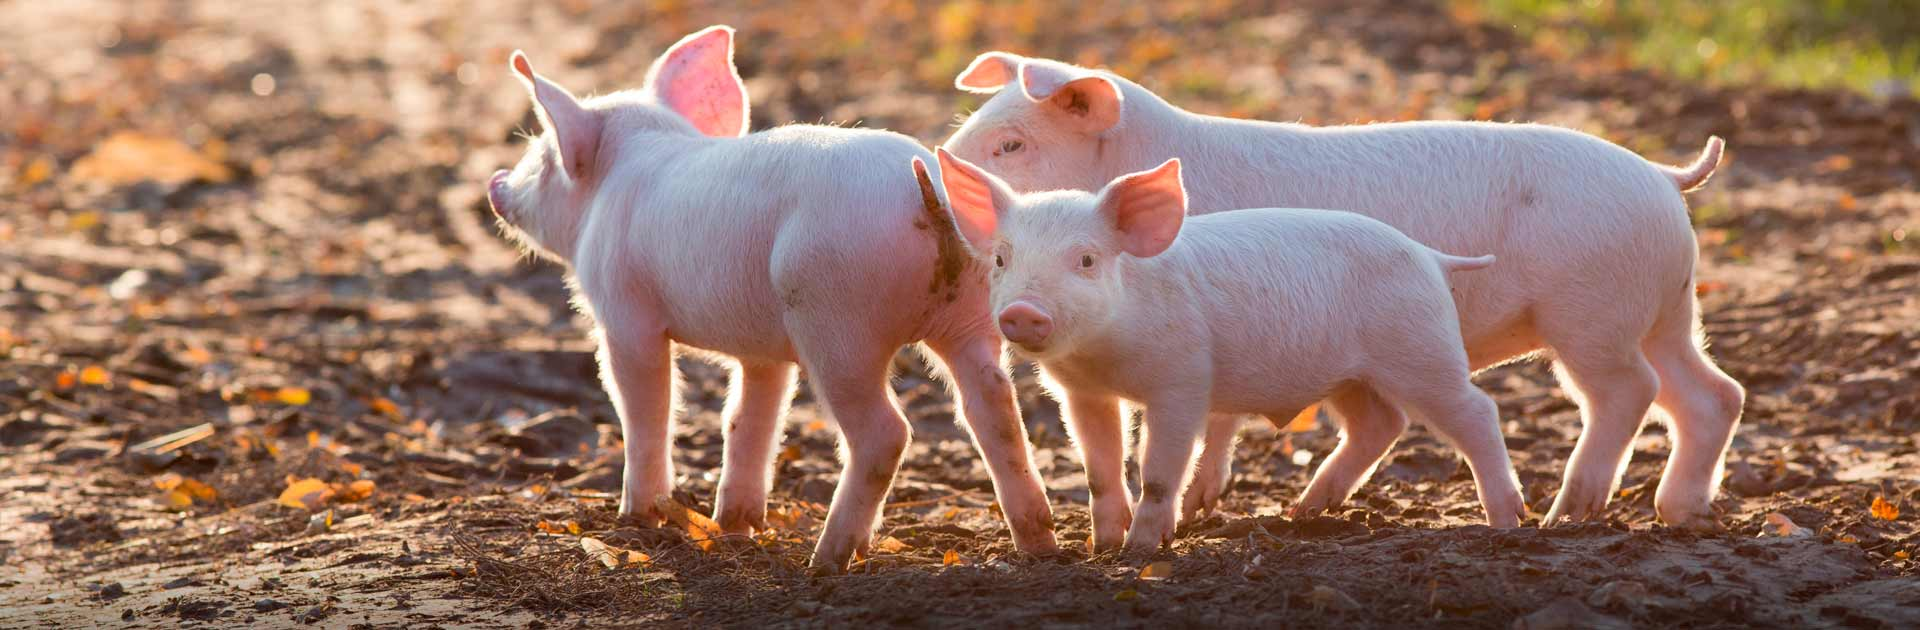 pigfarm Agrotrainee - Ukrainian agro practicants in Europe